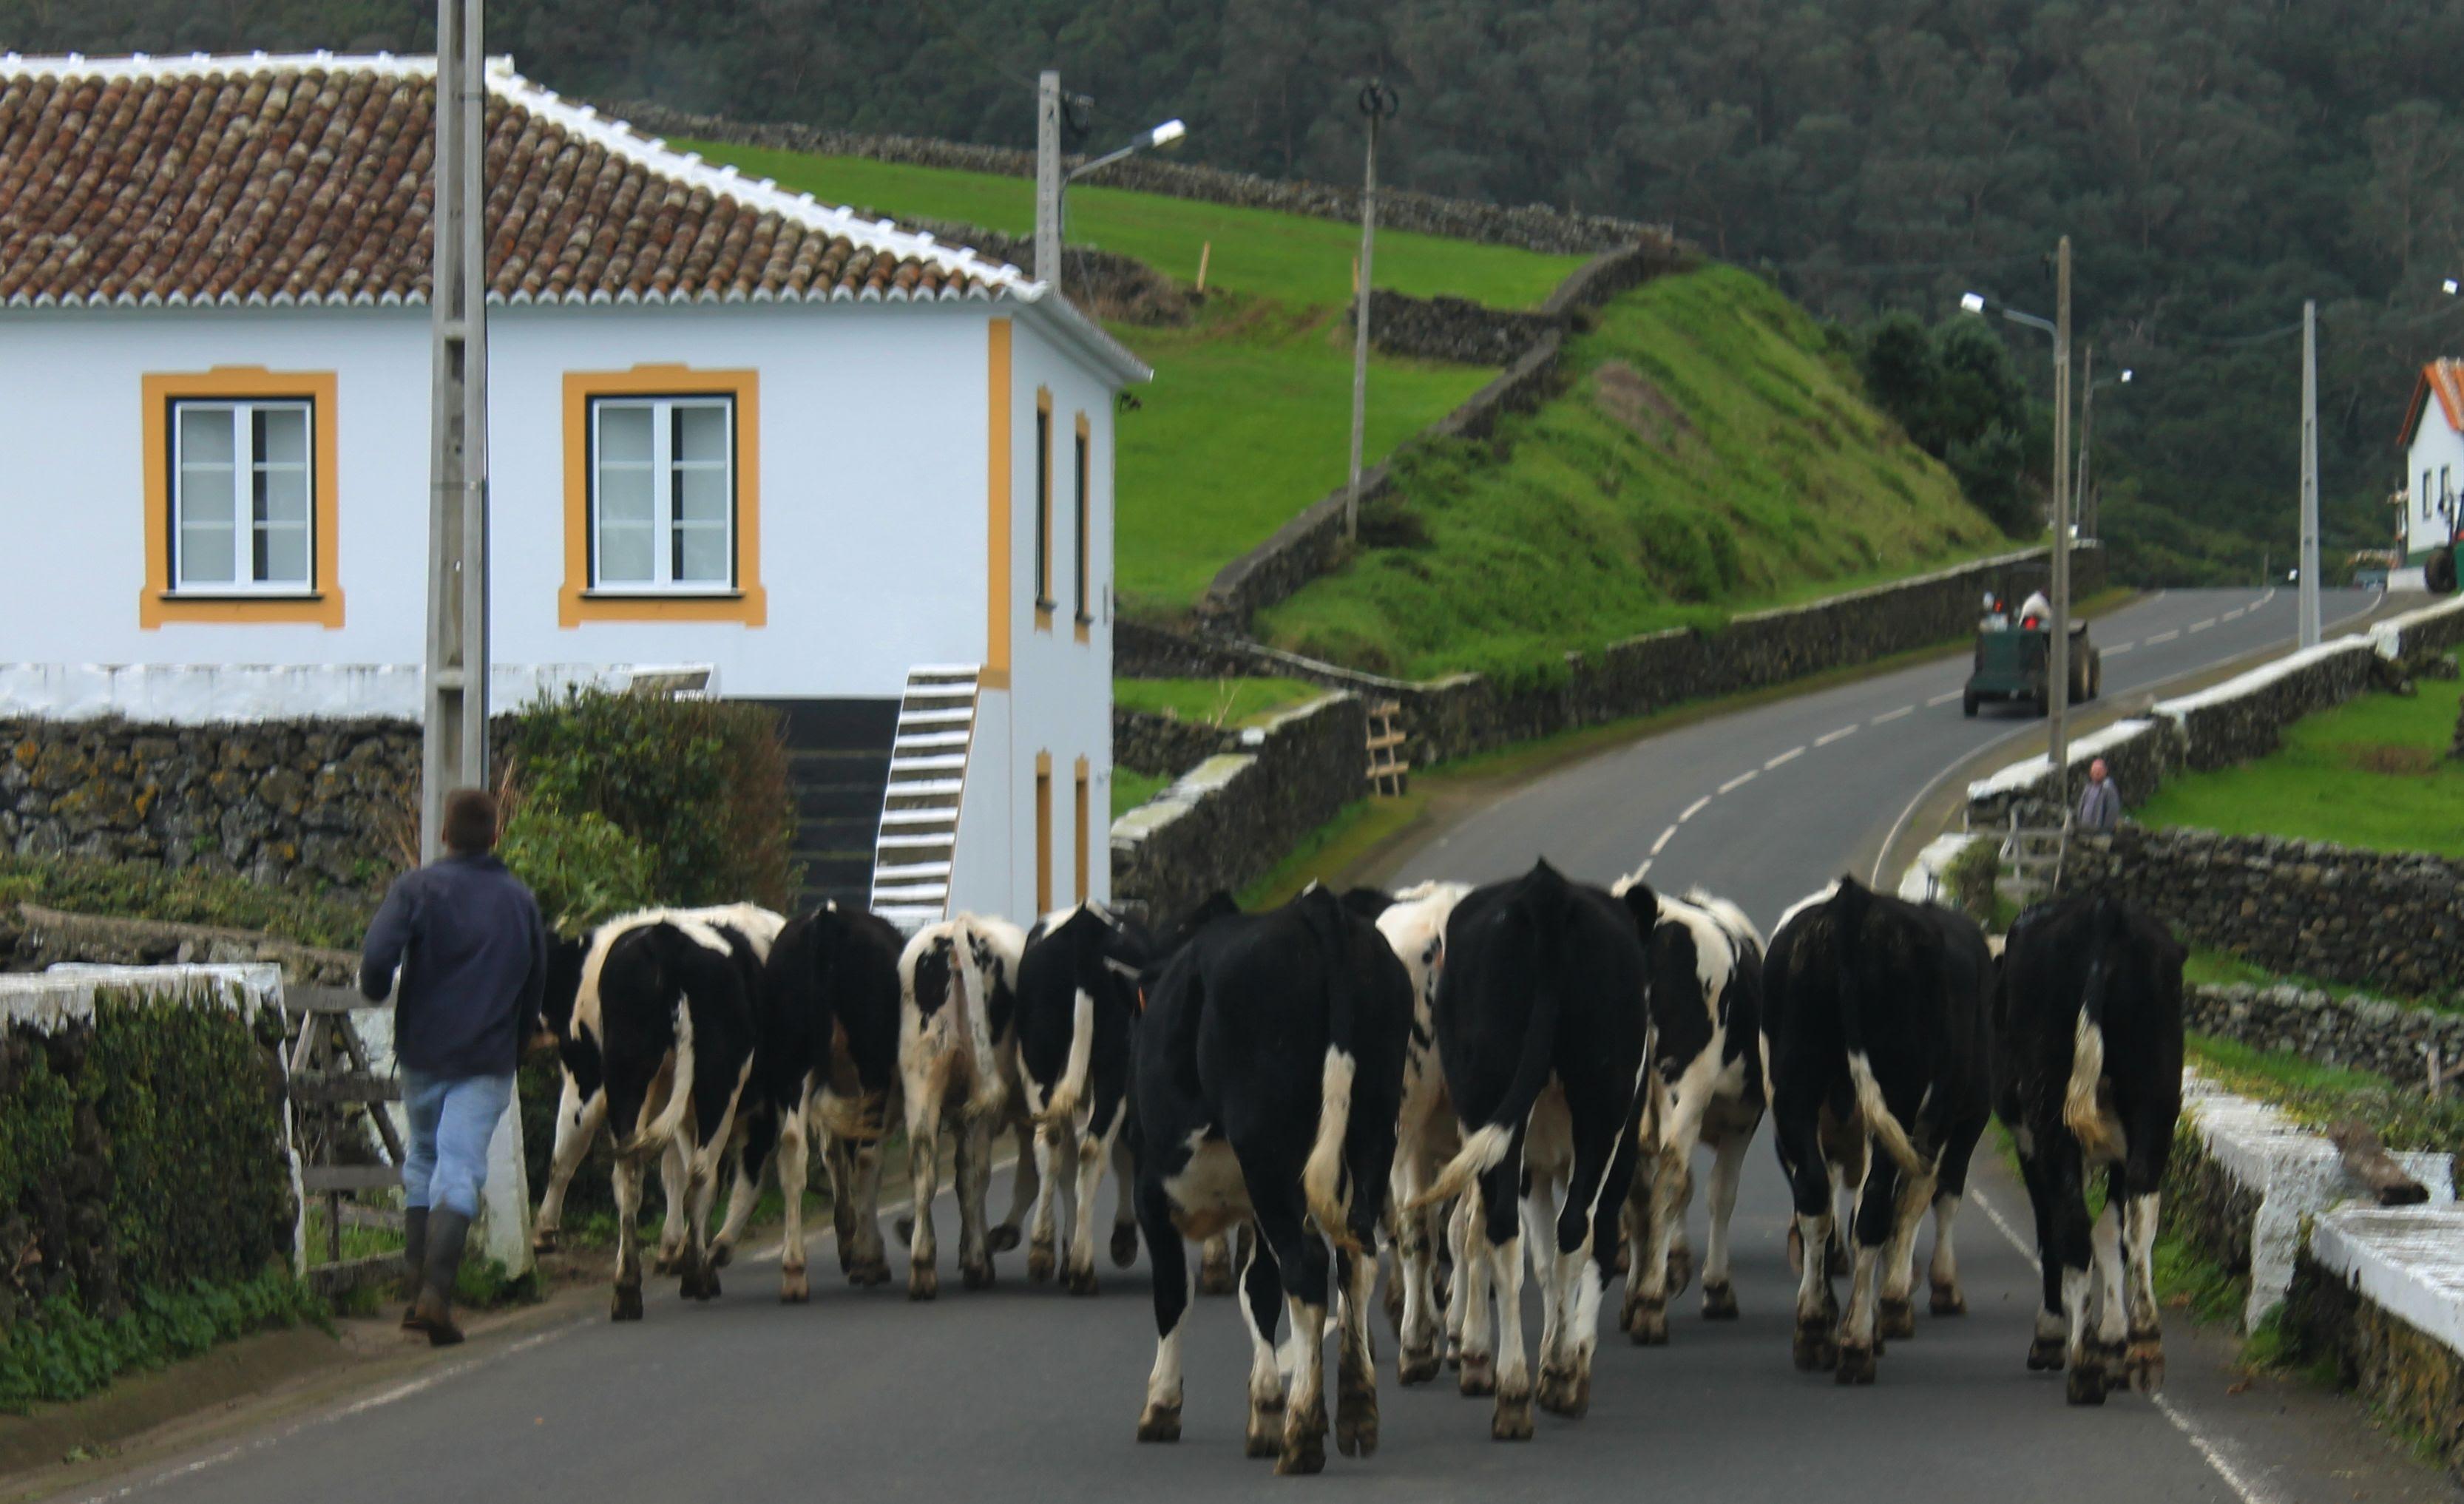 12. Cows a Walking